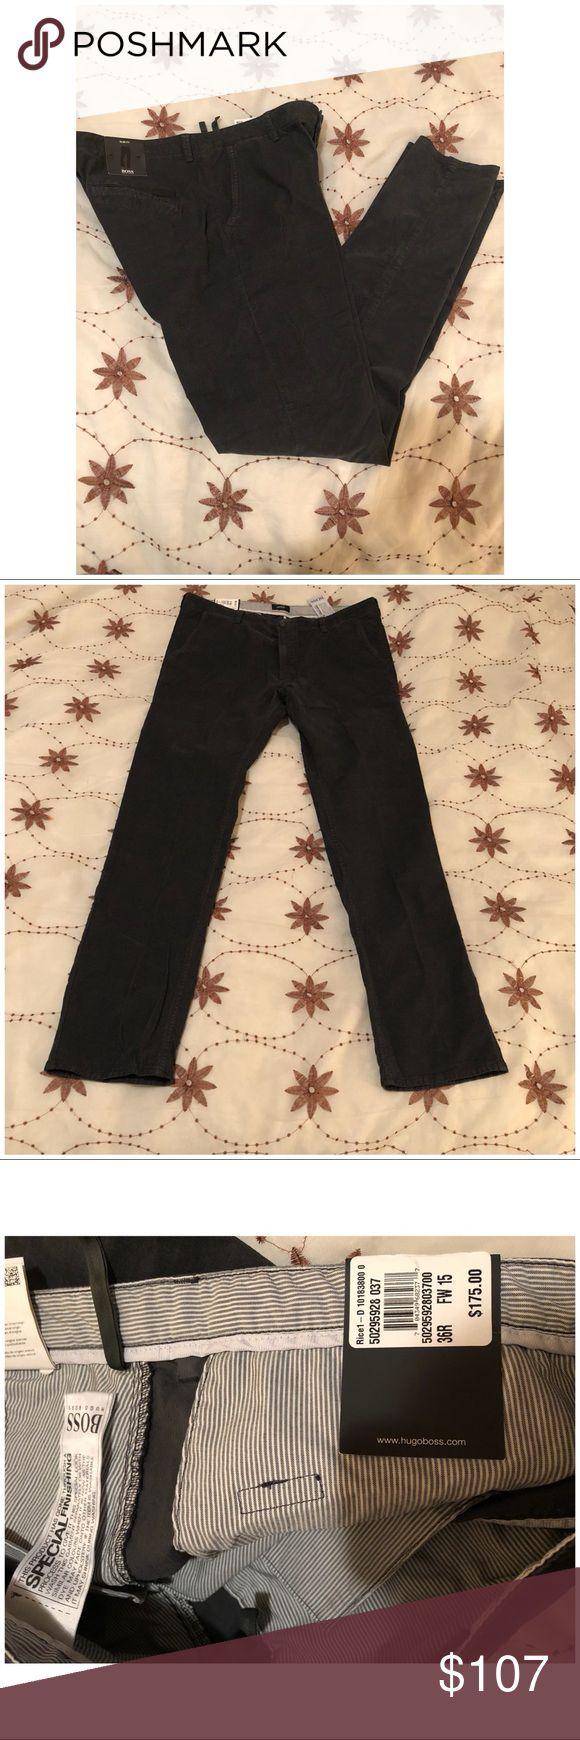 NEW HUGO BOSS SLIM FIT MEN TROUSERS COTTON HUGO BOSS SLIM FIT TROUSERS! 👖💯 Hugo Boss Jeans Slim Straight